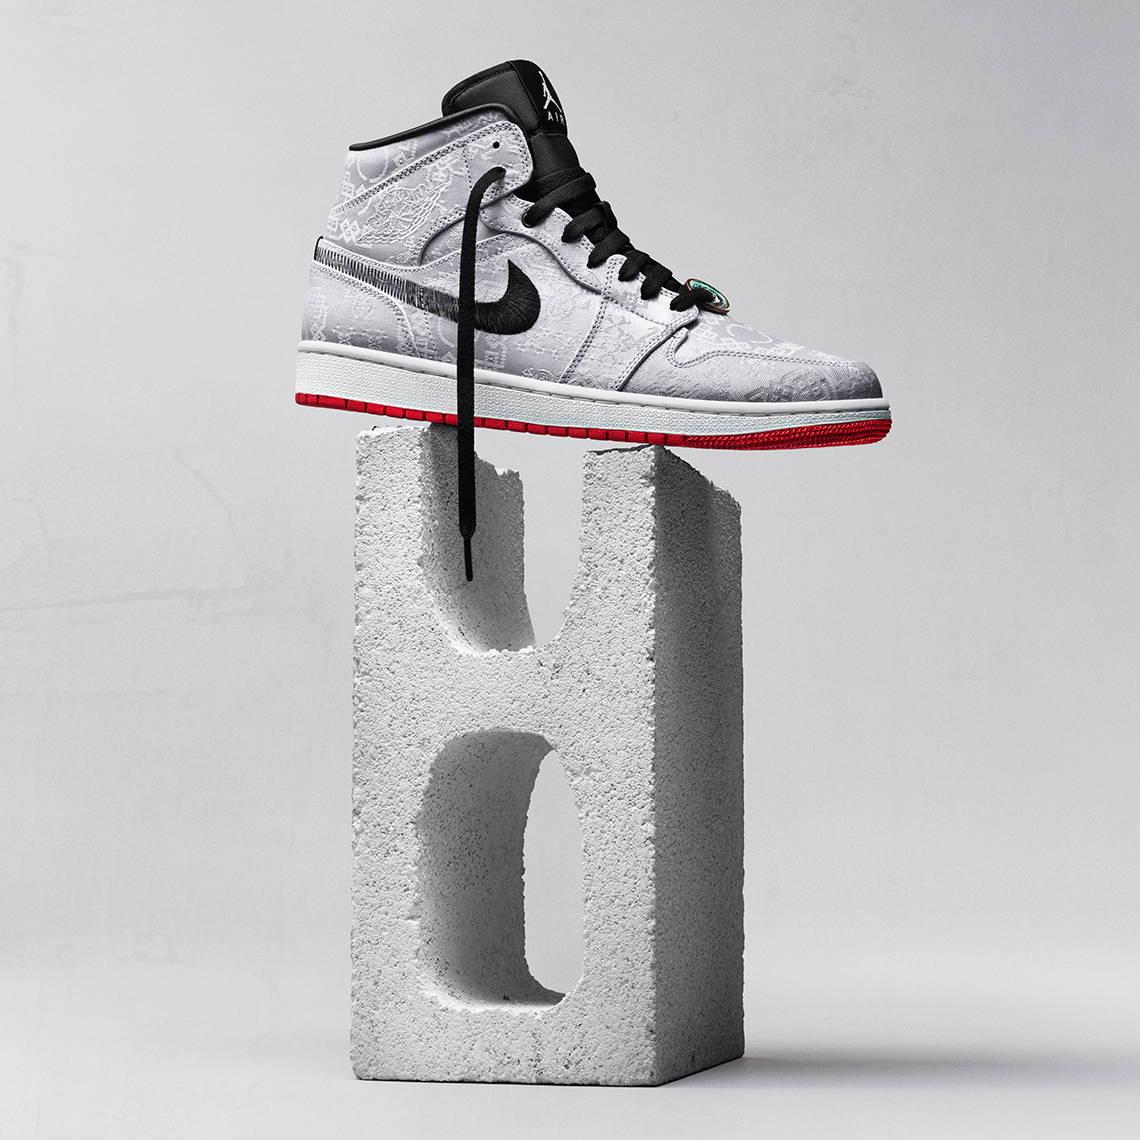 air-jordan-1-mid-fearless-clot-cu2804-100-release-date-sneakers-heat